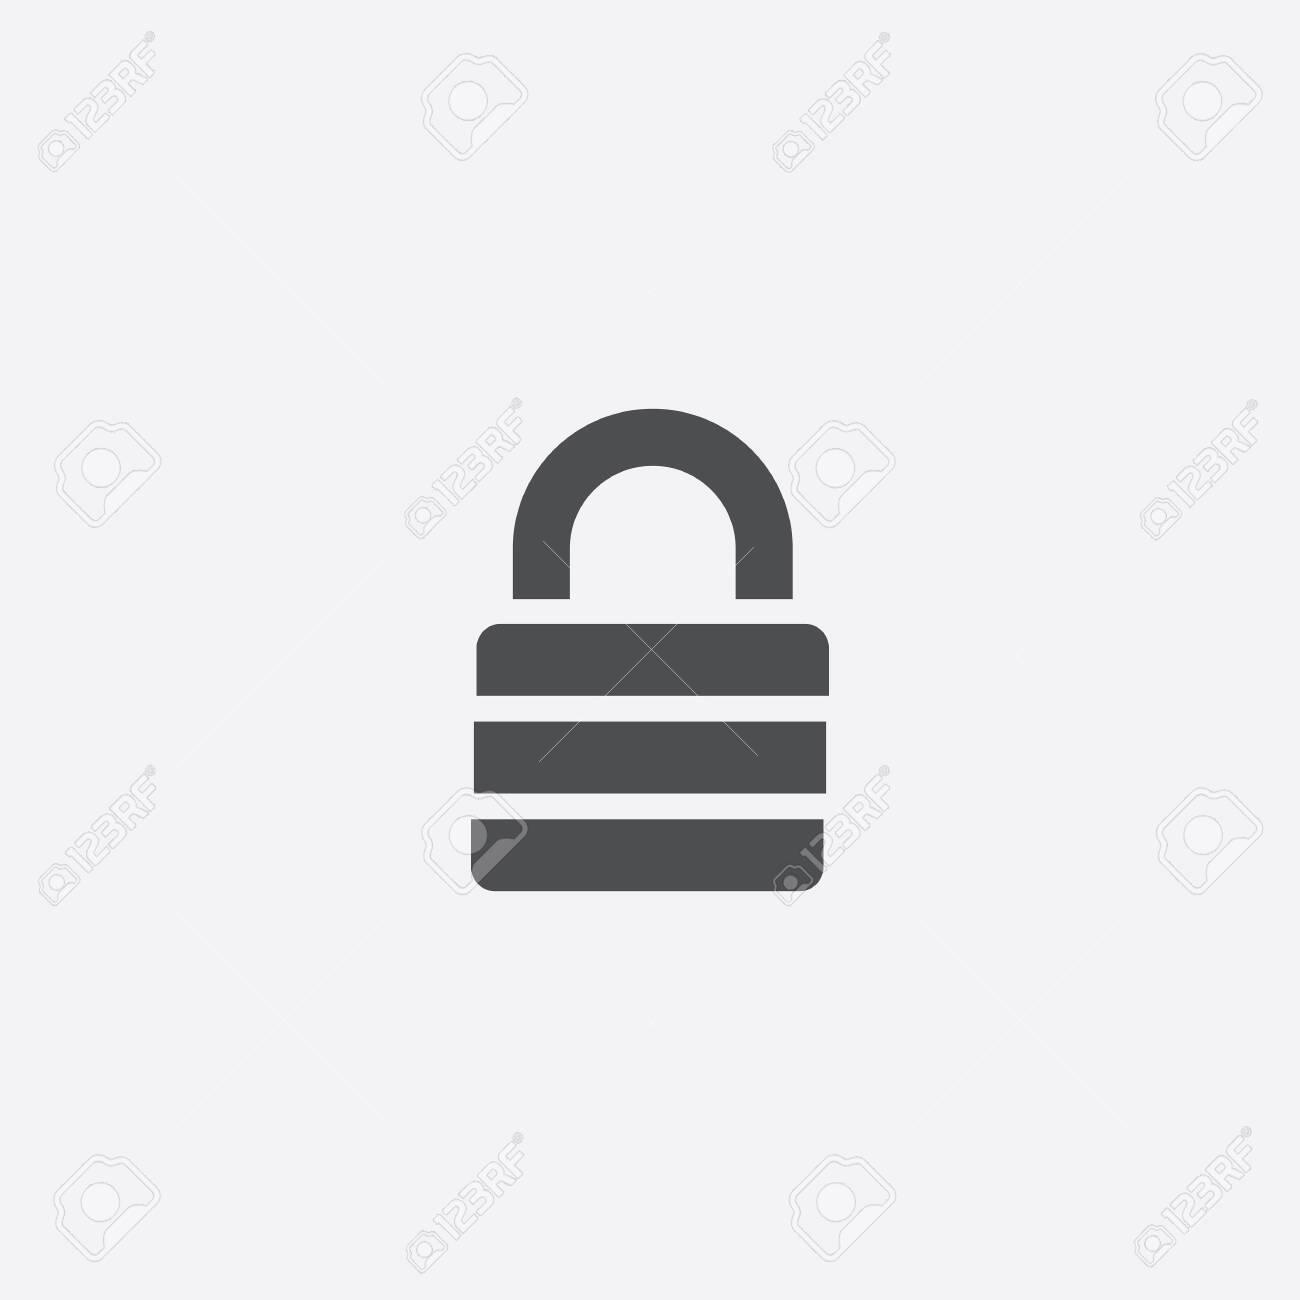 lock icon - 143059808